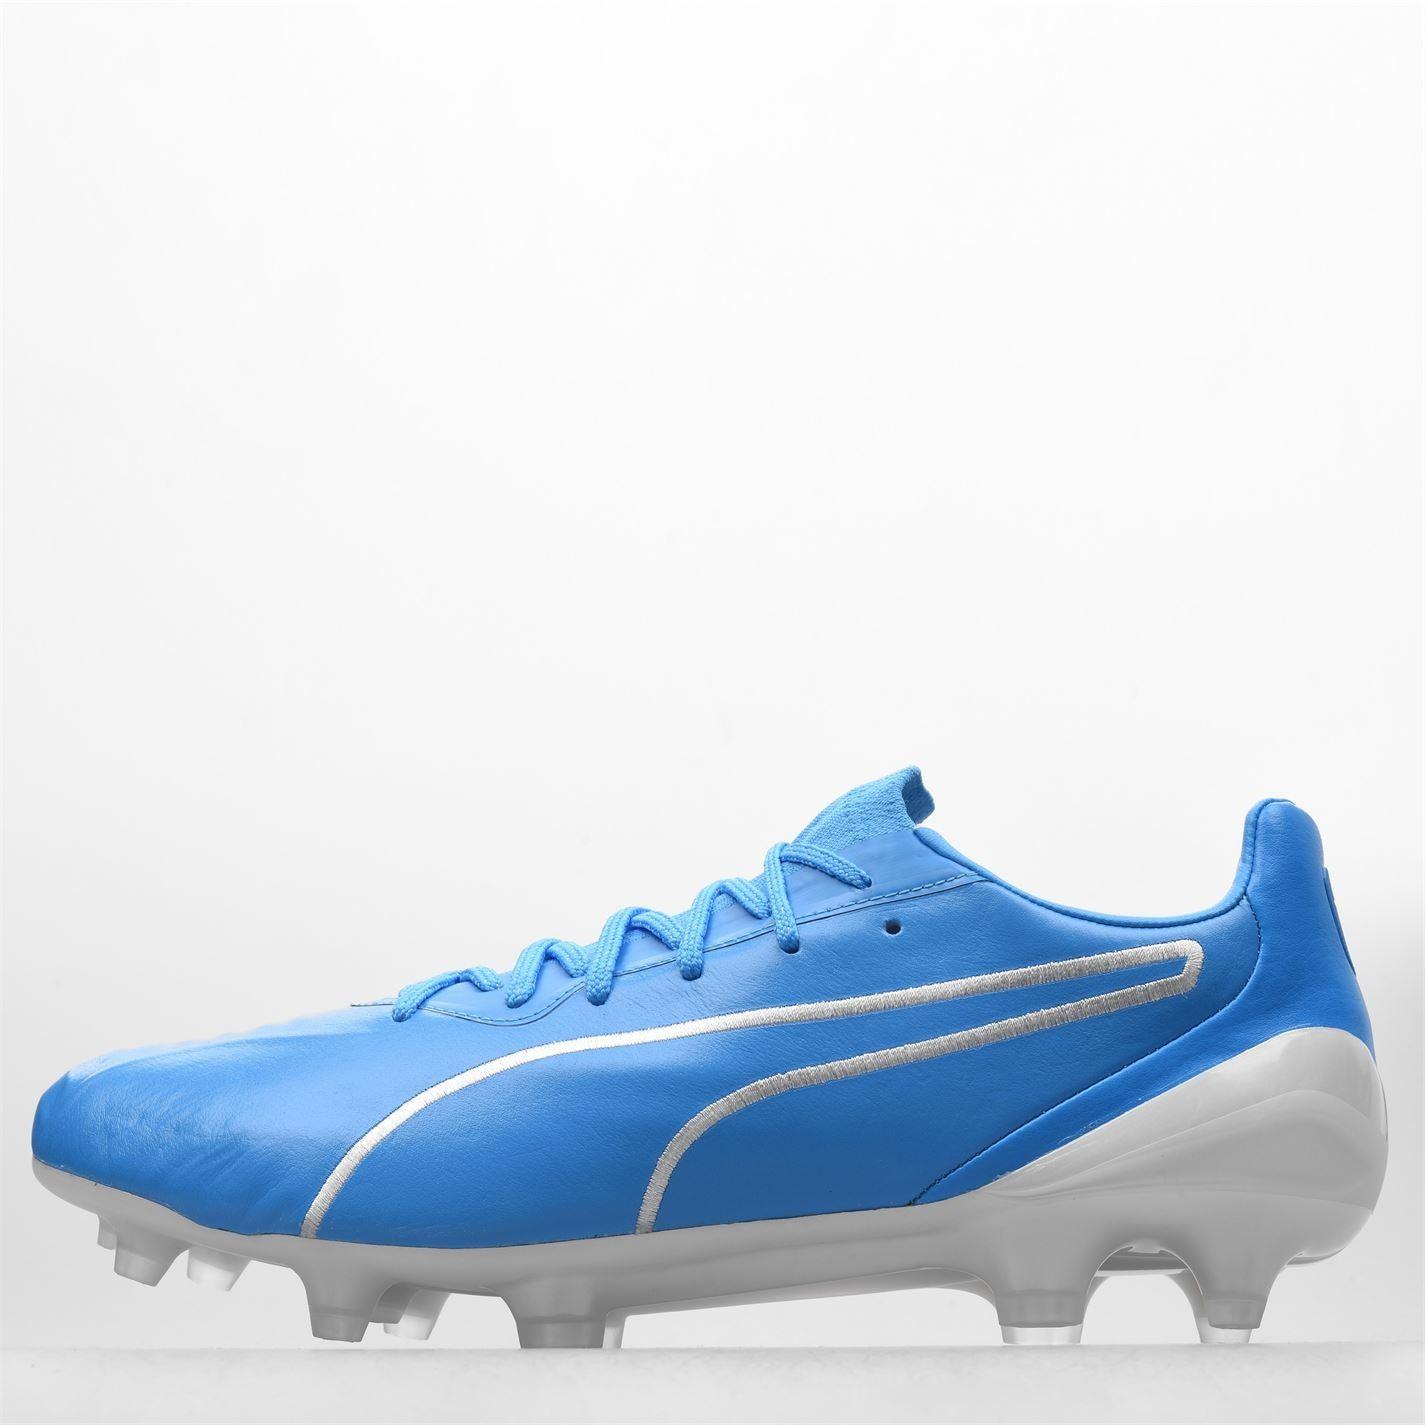 miniature 10 - Puma-King-FG-Firm-Ground-Football-Bottes-Homme-Chaussures-De-Foot-Crampons-Baskets